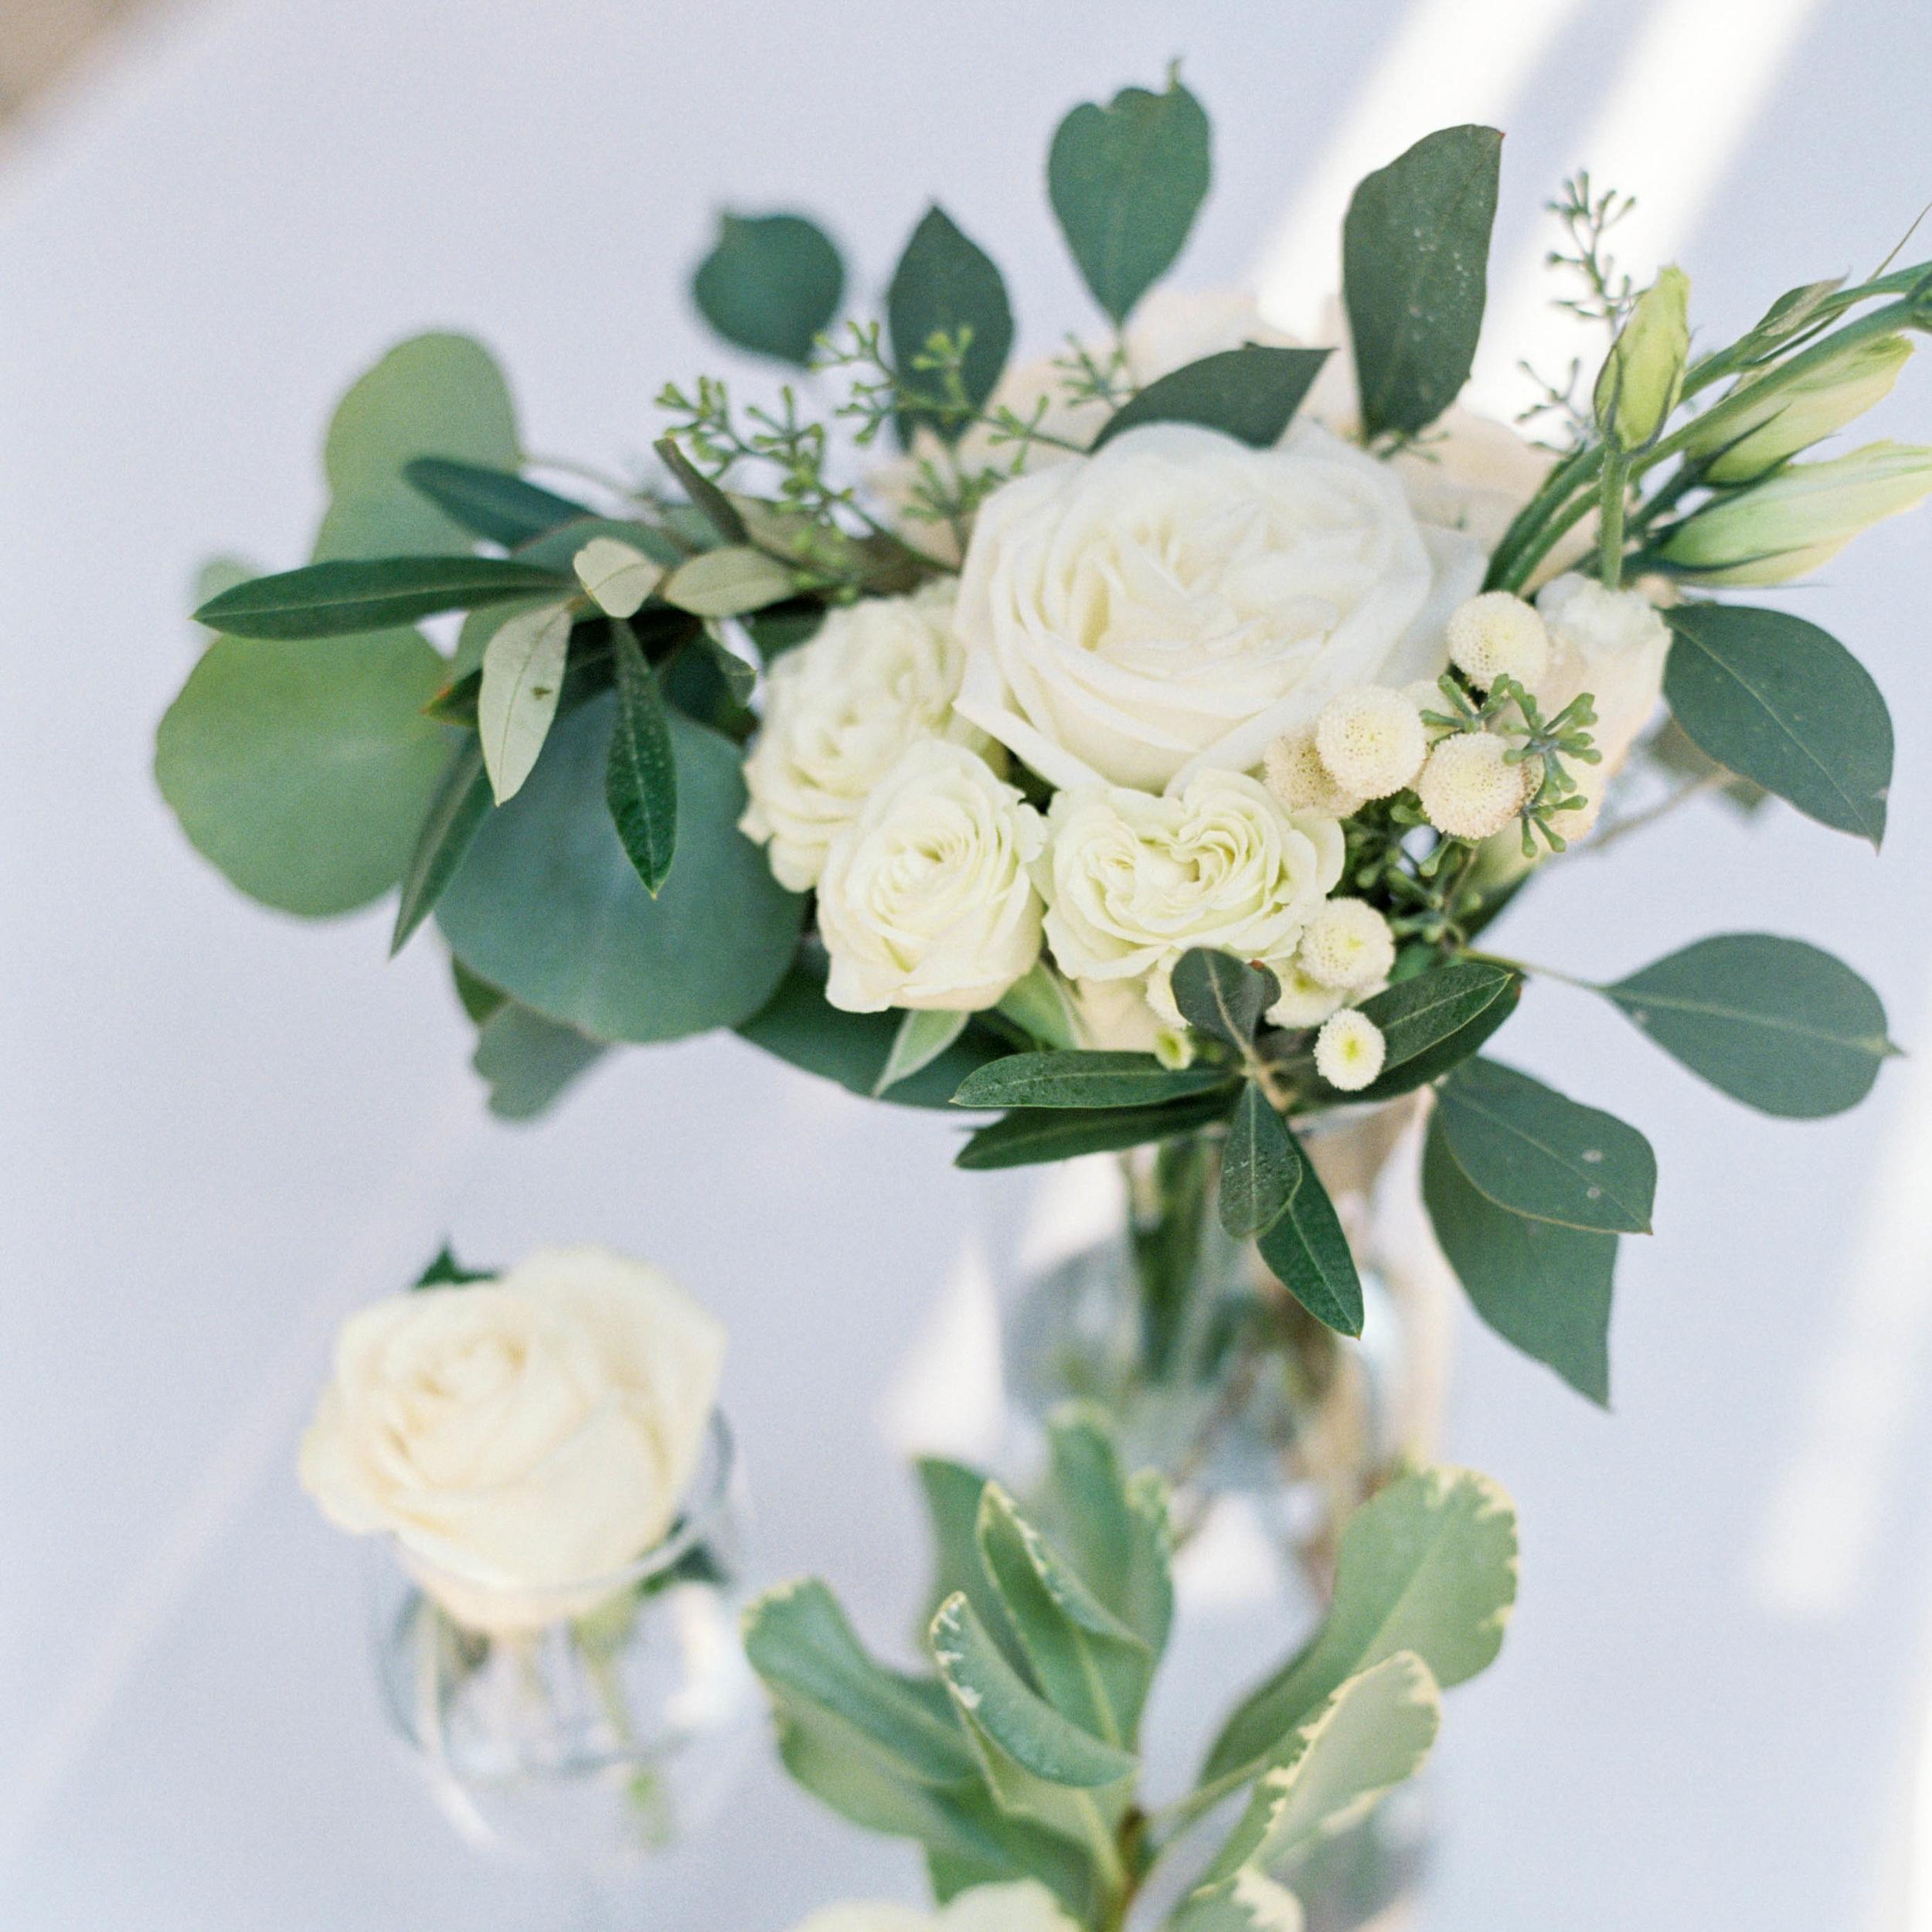 Meghan-mehan-Presentation-Center_Wedding-flowerstory.jpg